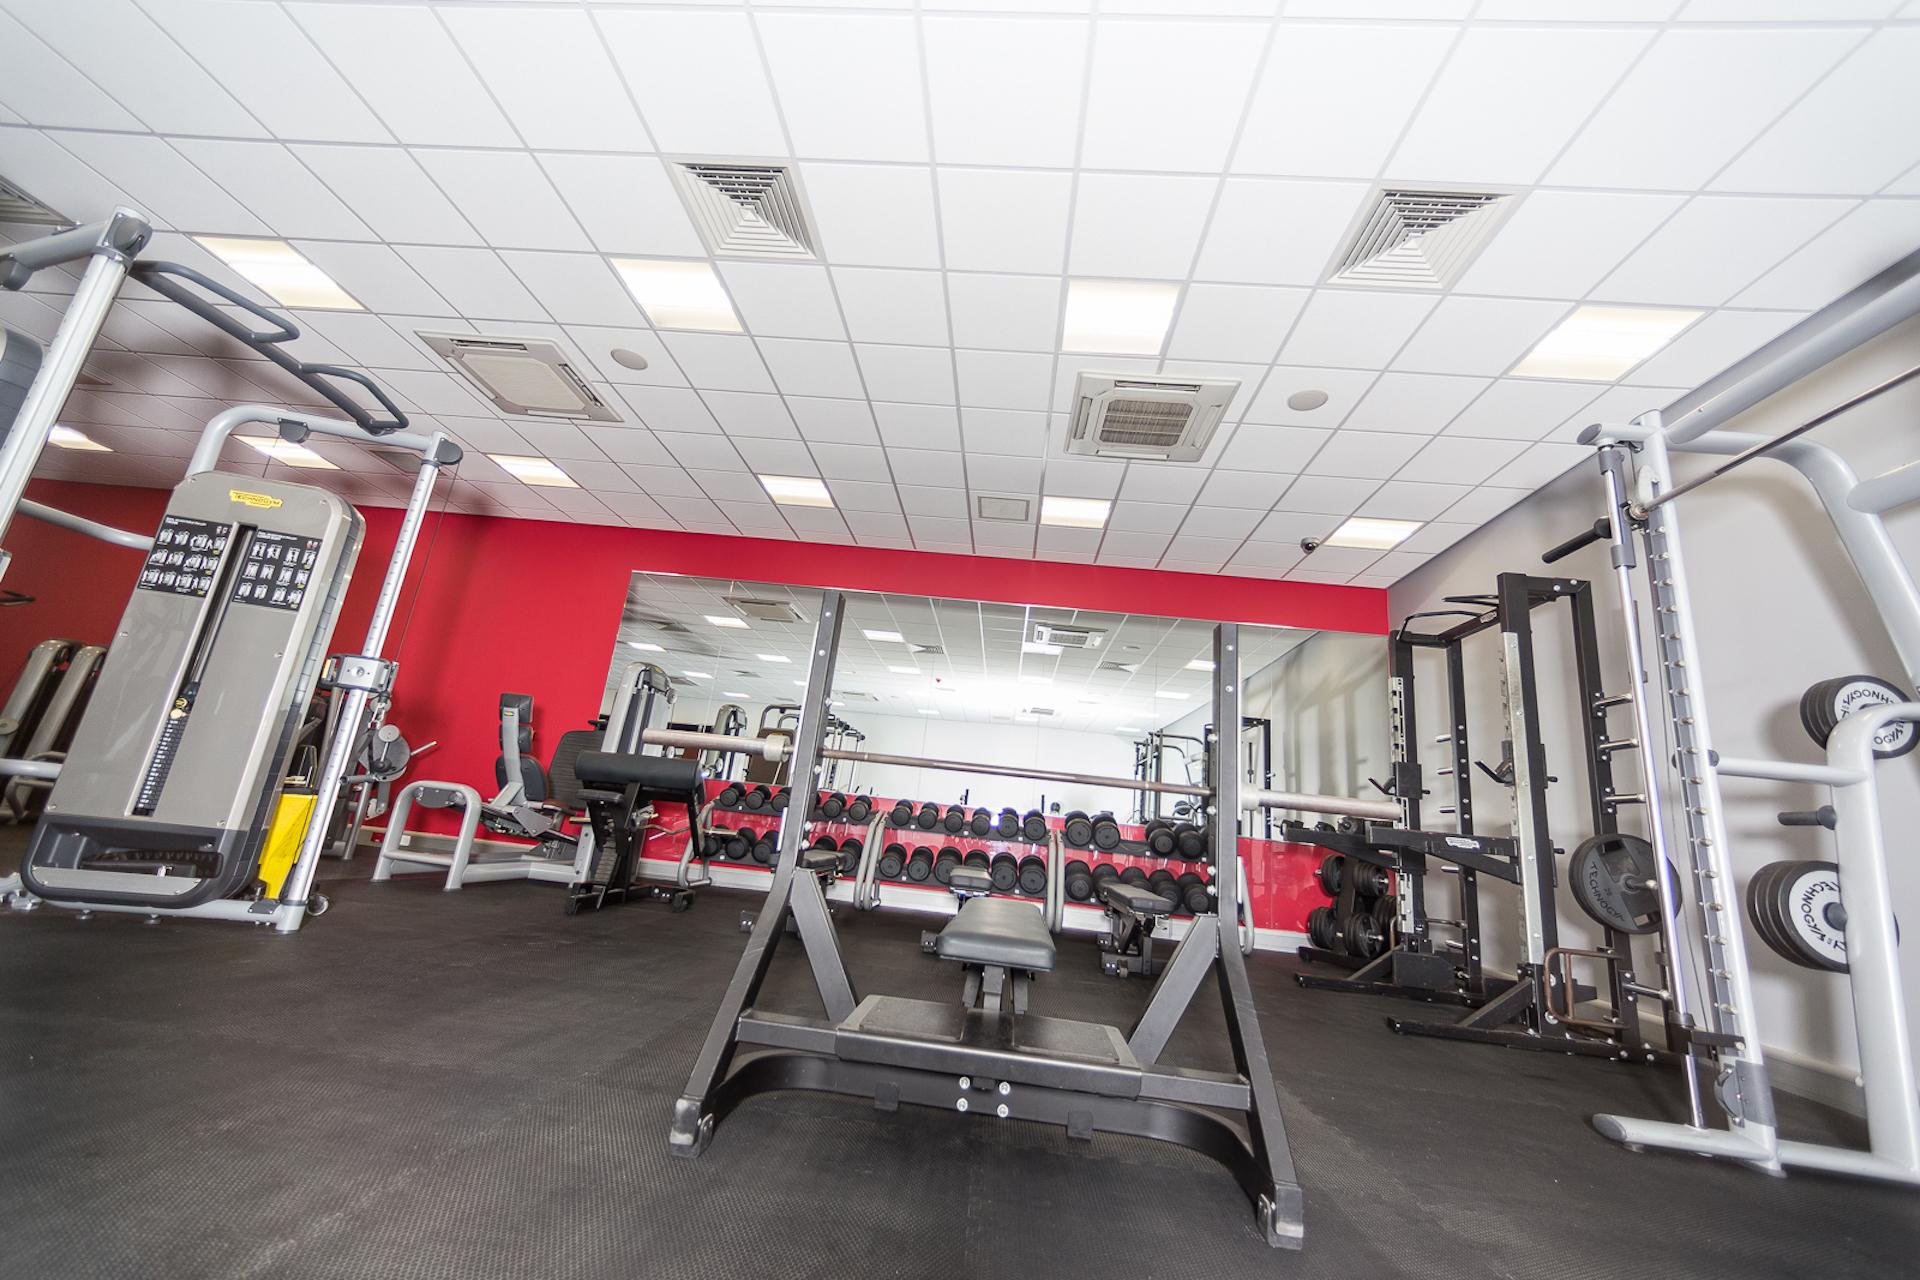 Colne Valley Leisure Centre 11